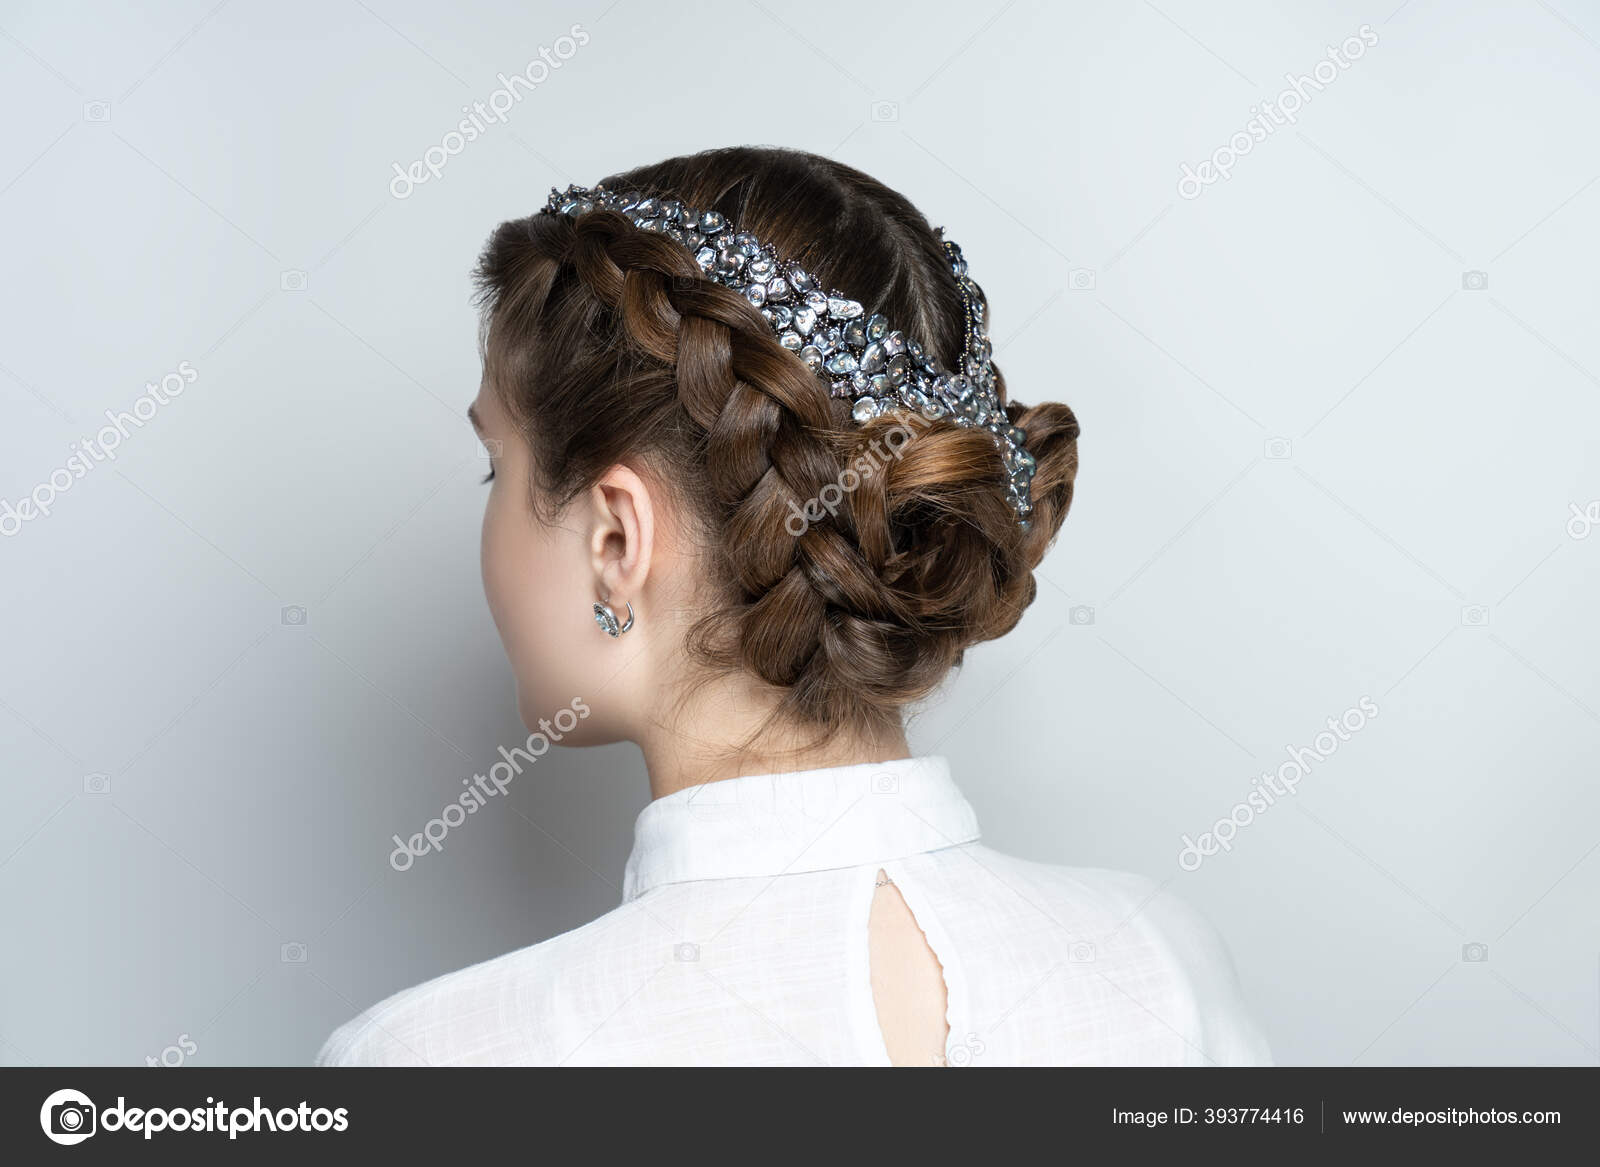 Potret Wanita Cantik Wanita Cantik Rambut Tebal Gaya Rambut Mewah Stok Foto C Olgaosa 393774416